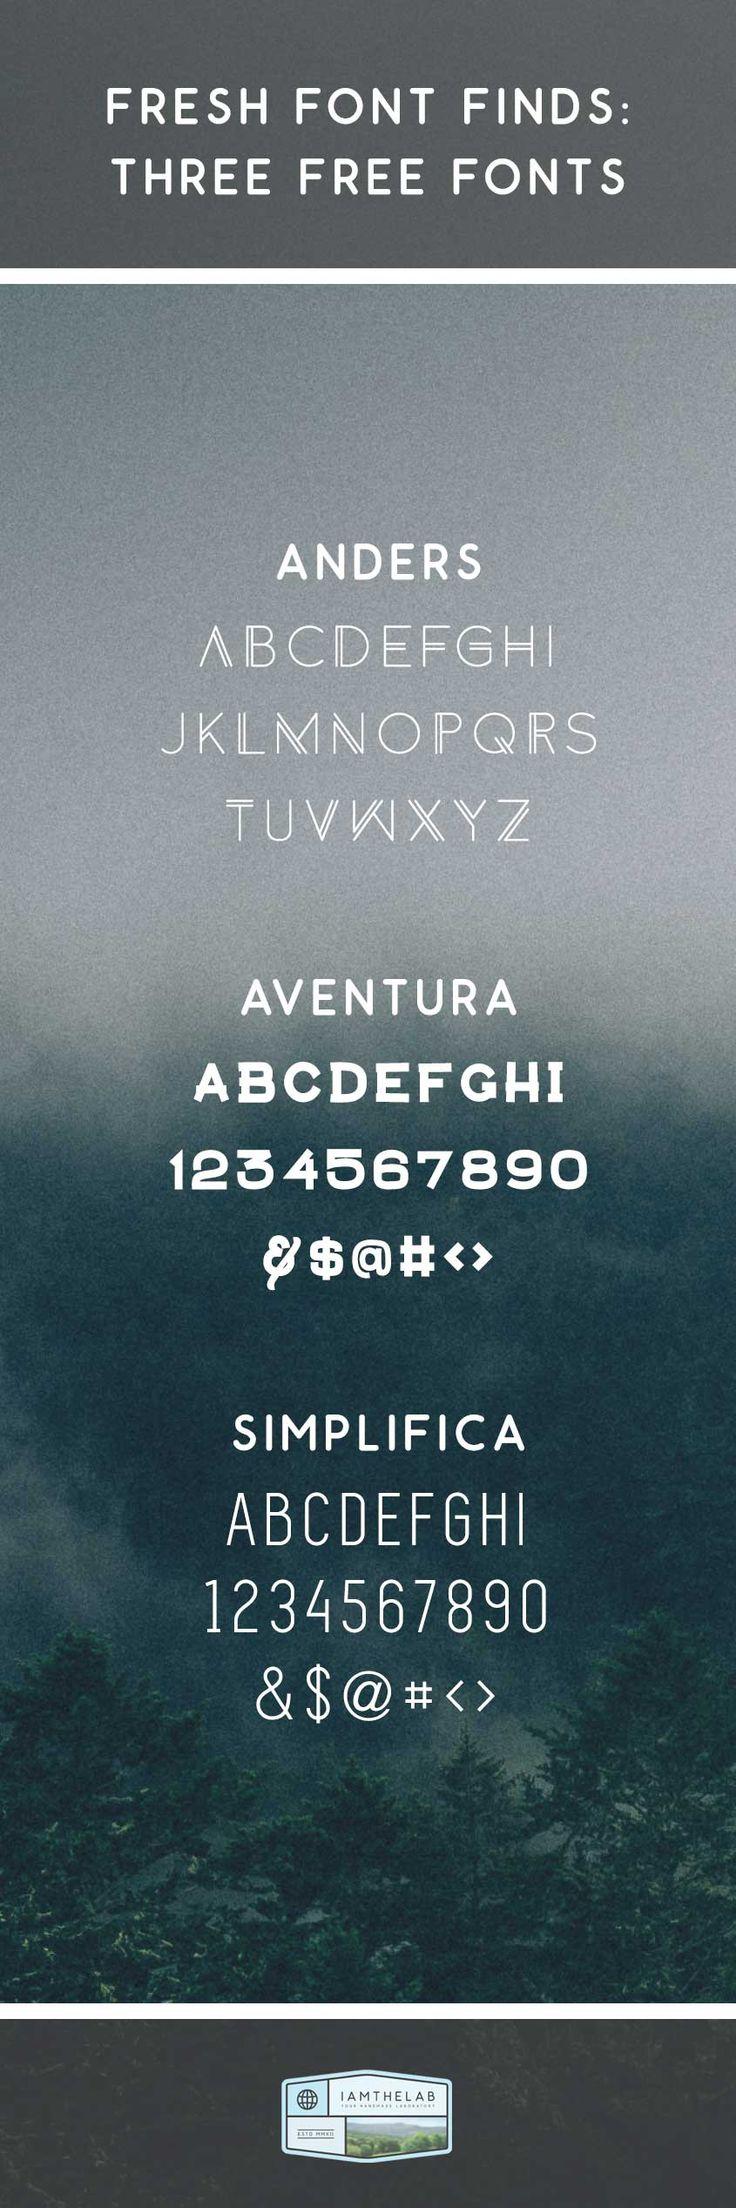 Get Inspired: September 15-19, 2014 Three Free Fonts: Anders, Aventura & Simplifica.